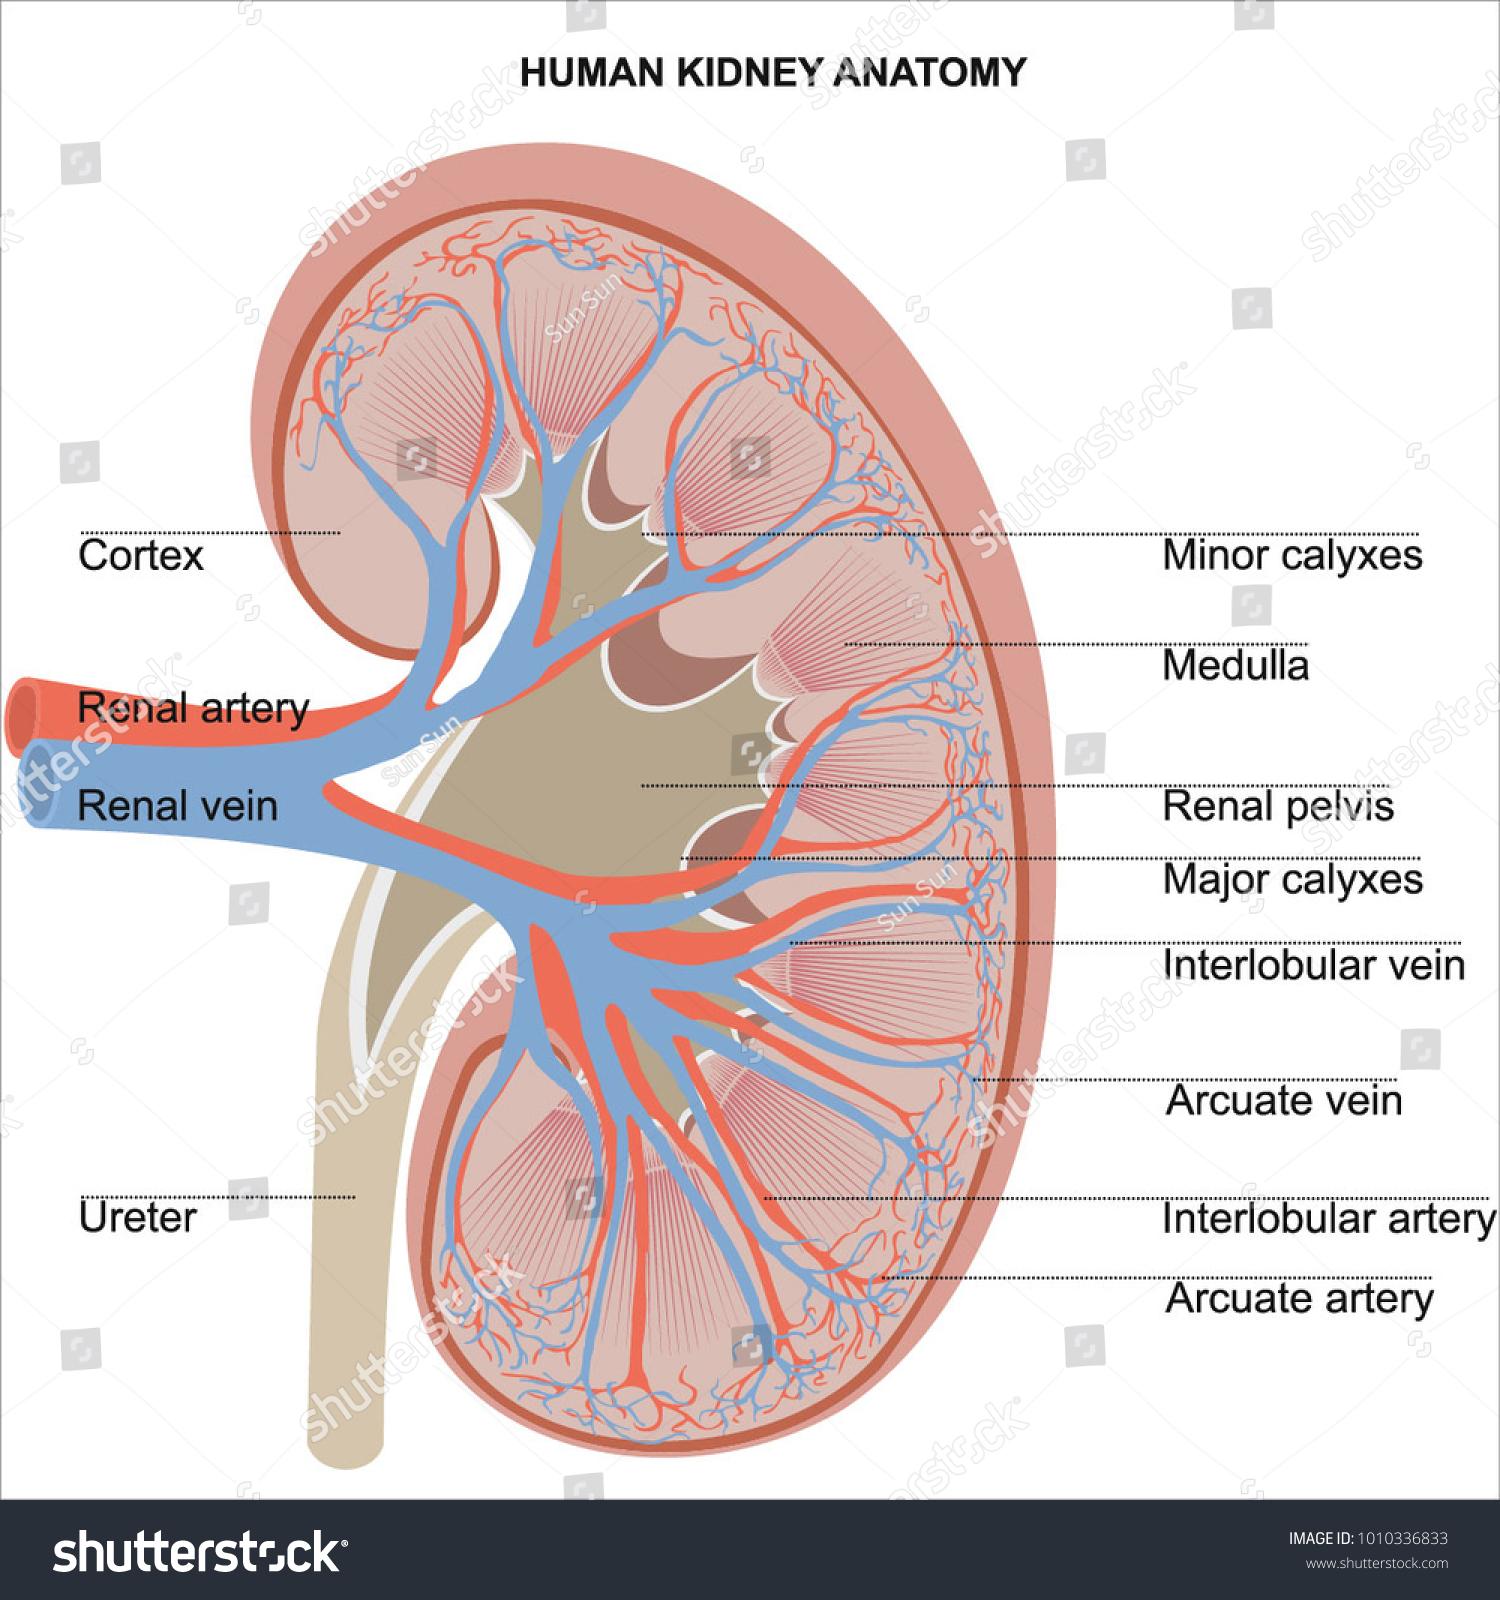 Human Kidney Anatomy Diagram Student Dissertation Stock Vector ...